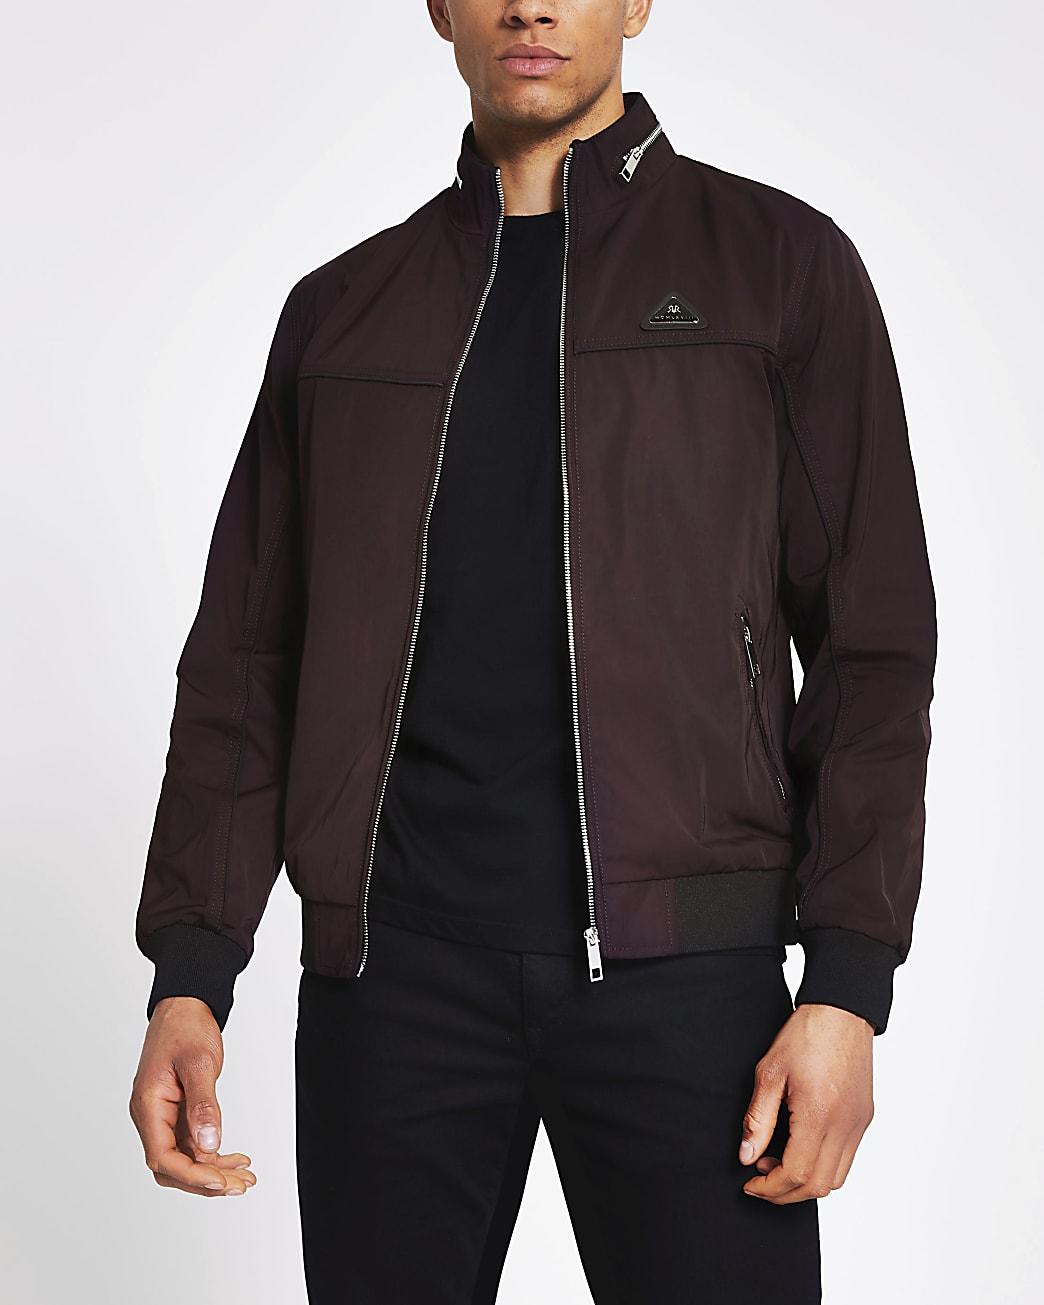 MCMLX dark red nylon racer jacket